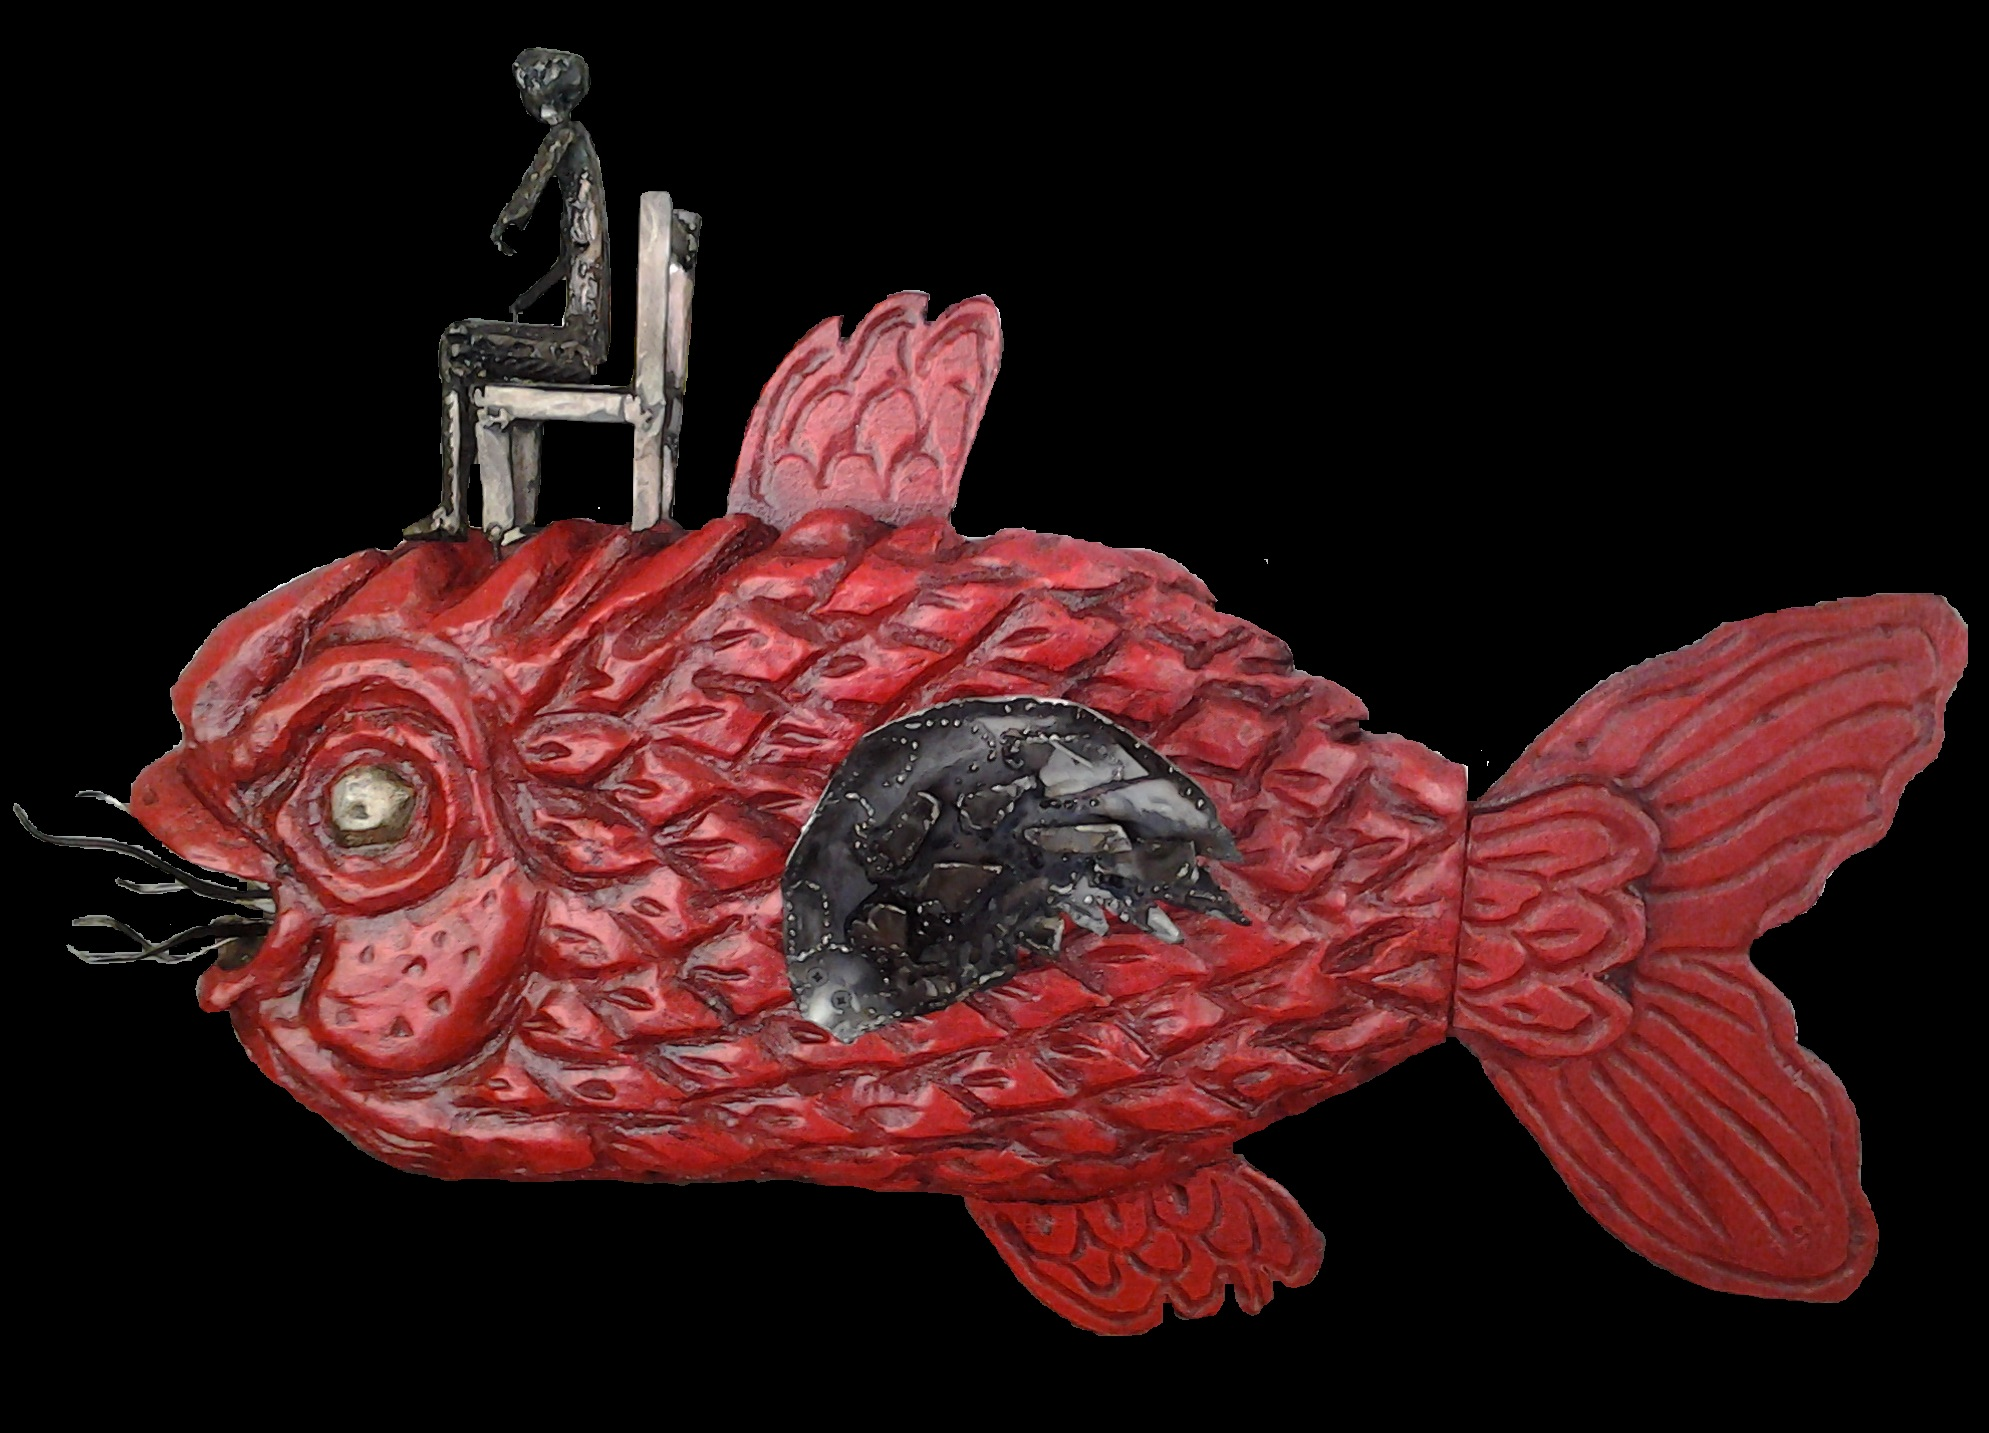 Reise des Odysseus, Holz-Stahl, 2012, 80 x 35 x 20 cm